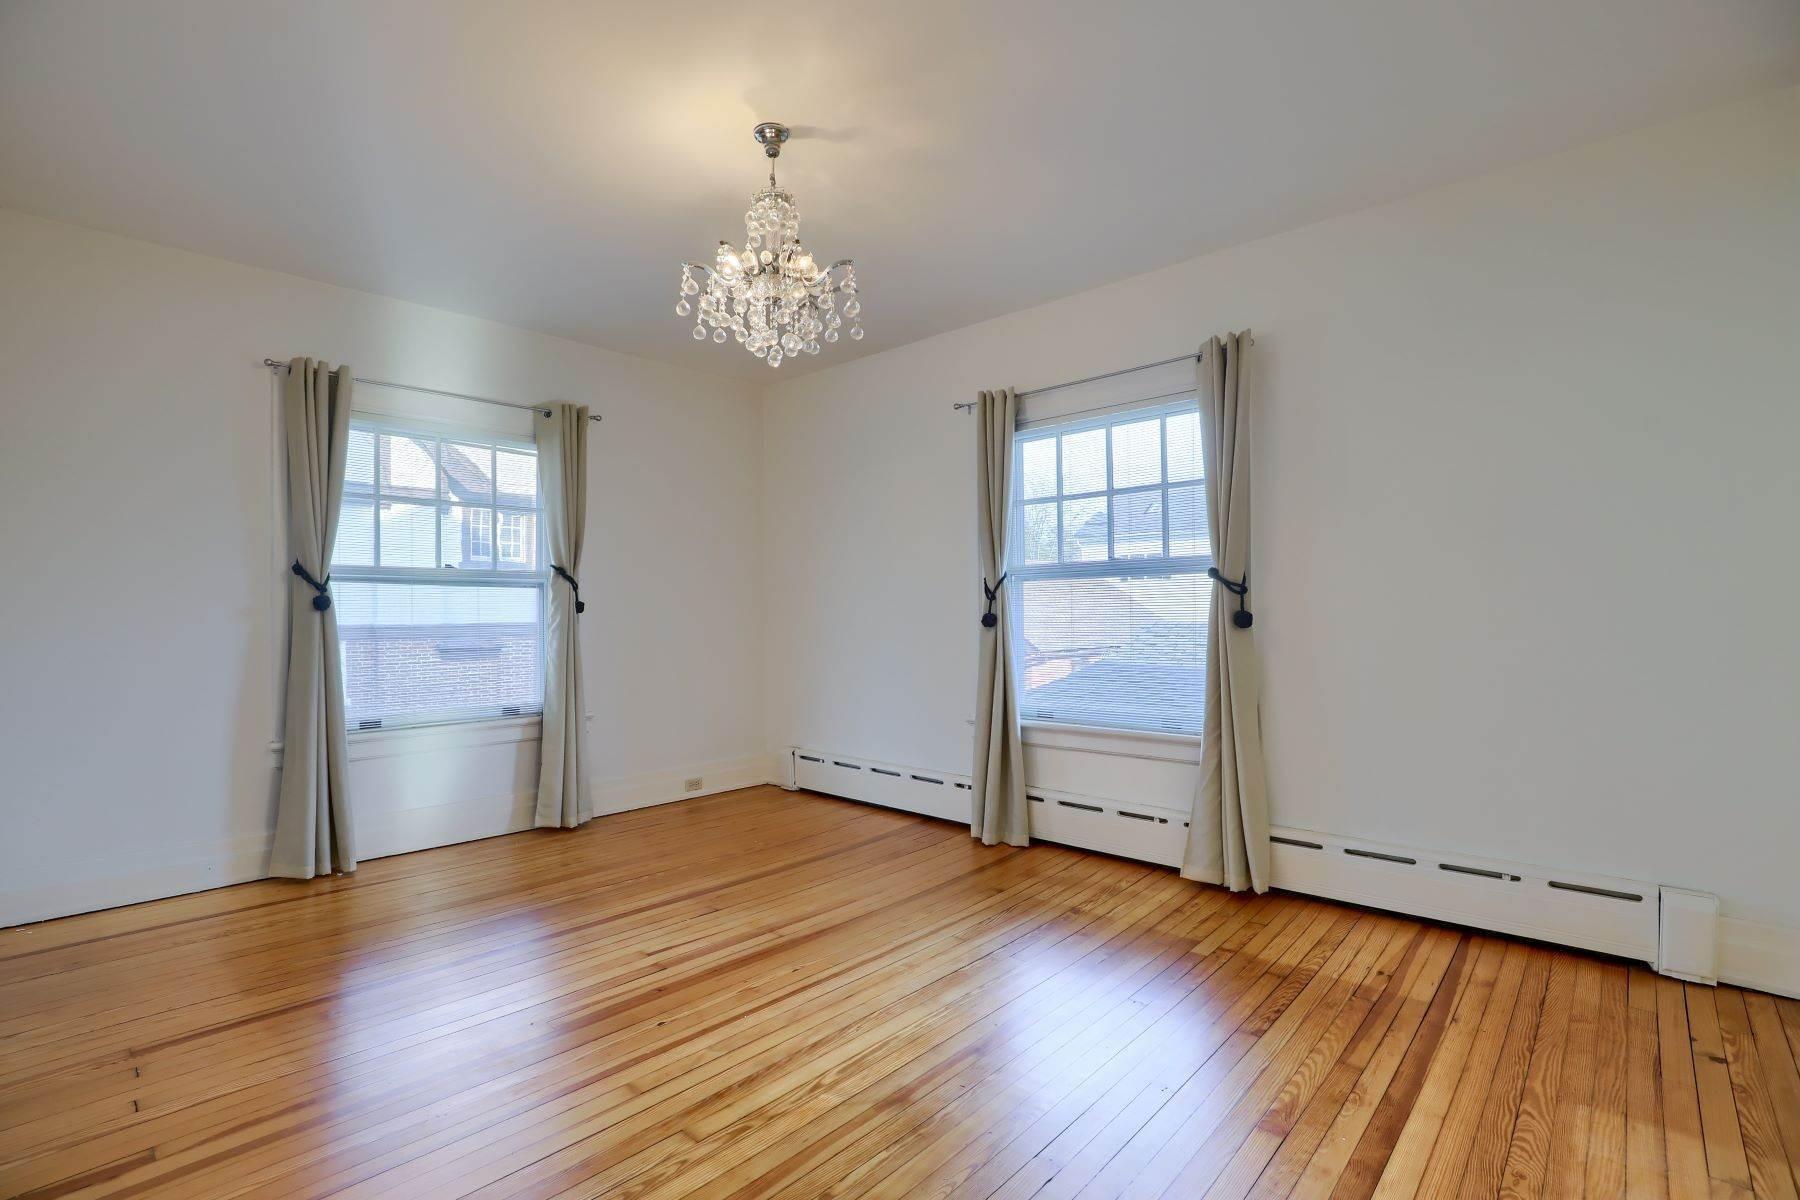 25. Single Family Homes for Sale at 206 E Granada Ave Hershey, Pennsylvania 17033 United States